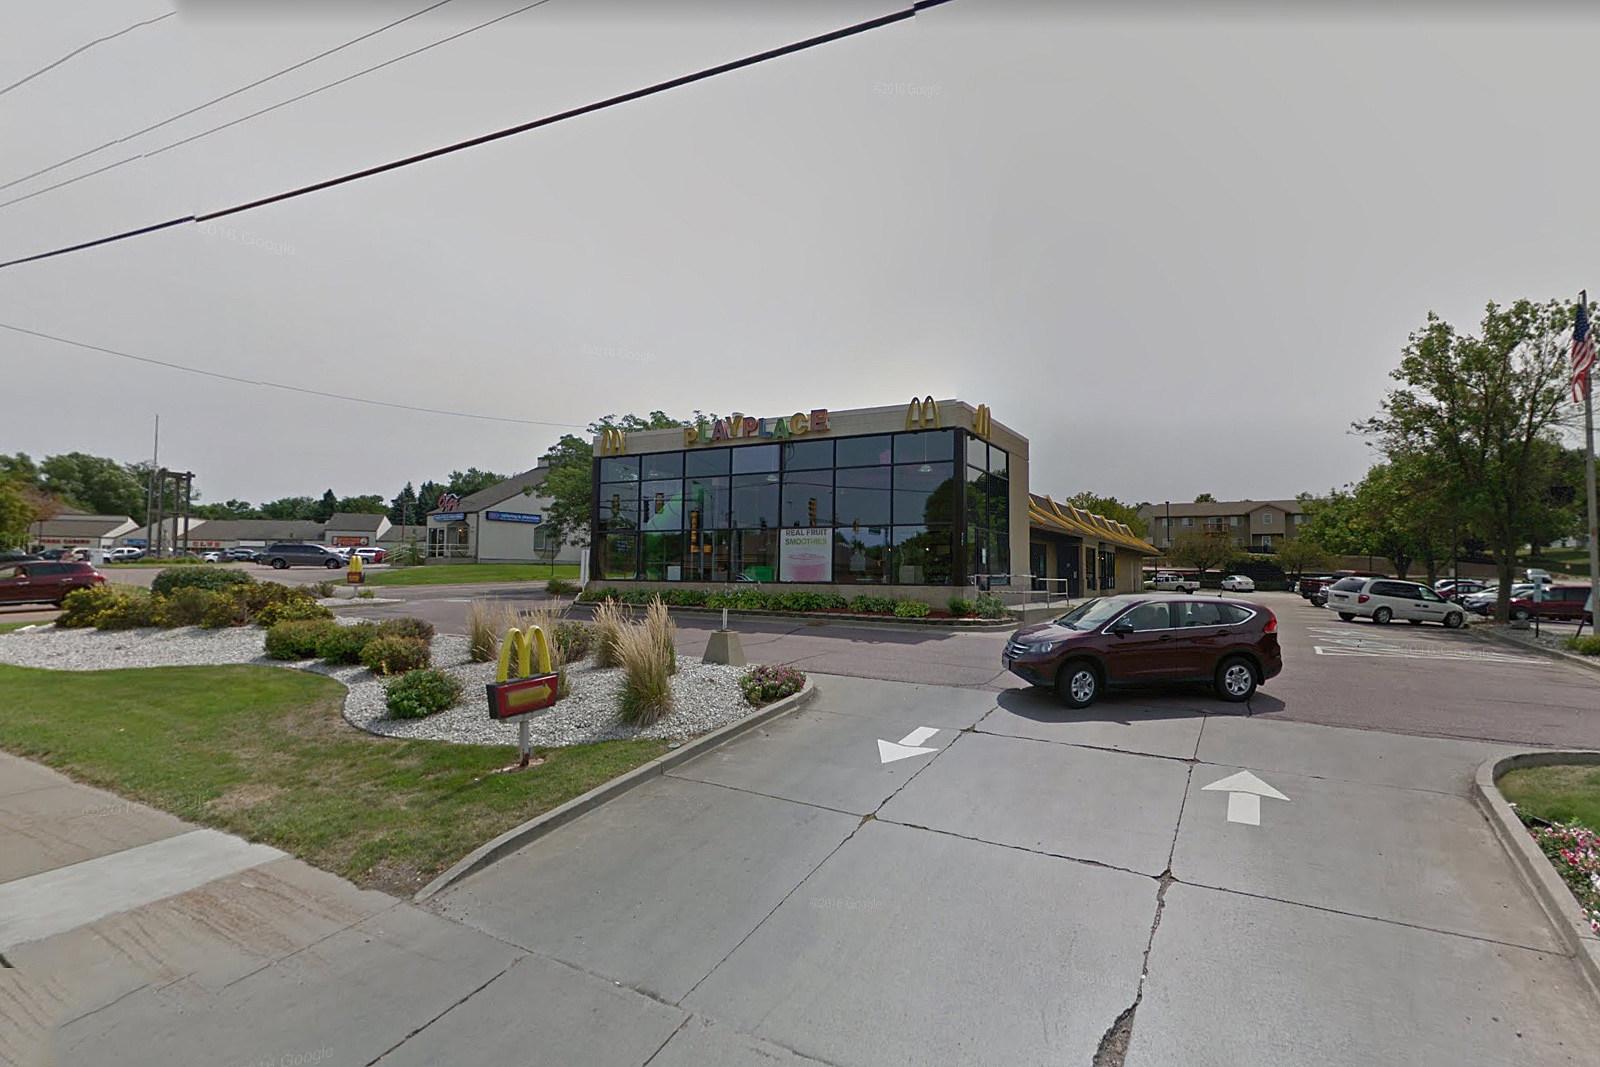 McDonalds, 26th Street, Sioux Falls